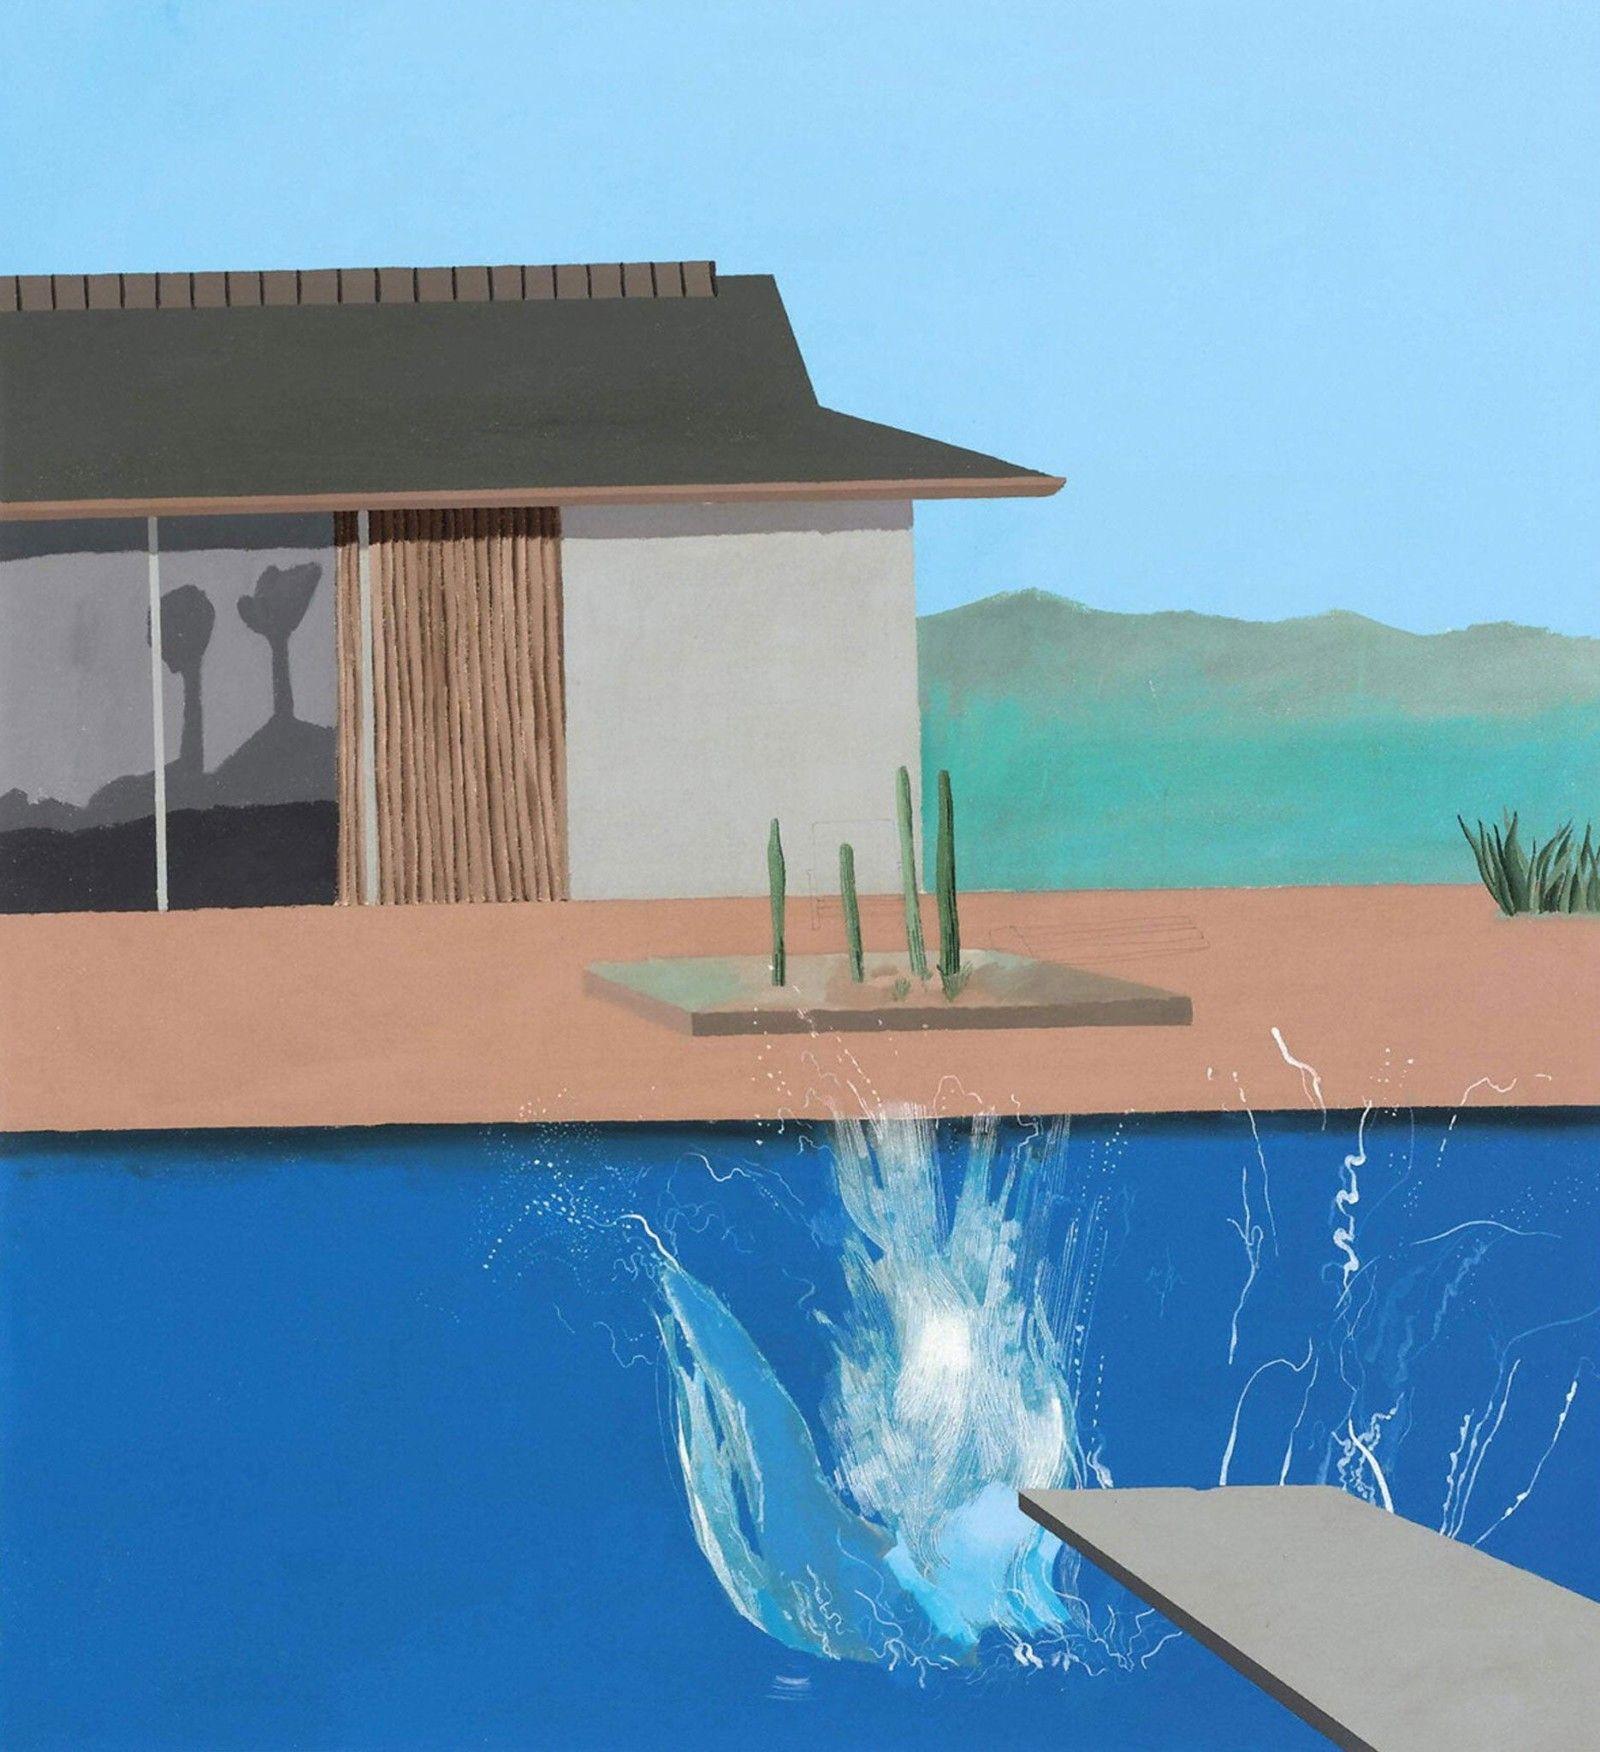 David Hockney – The Splash, 1966, acrylic on canvas, 183 x 183 cm (72 x 72  in.) | David hockney paintings, David hockney, David hockney artwork